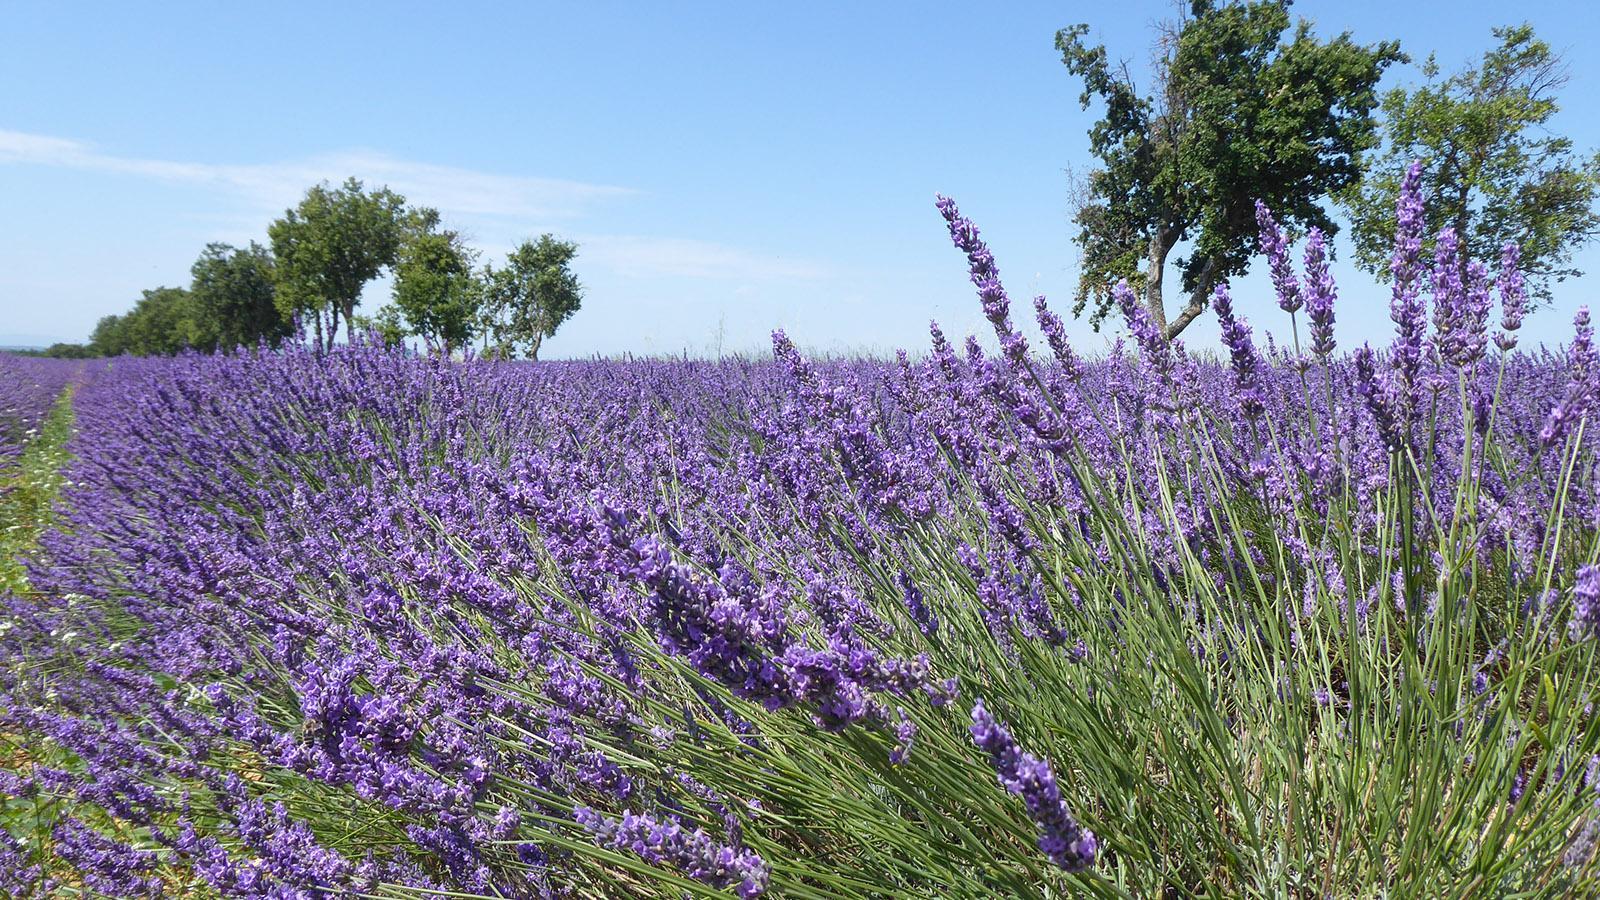 Die Lavendelblüte 2020. Foto: Susanne Knechtges